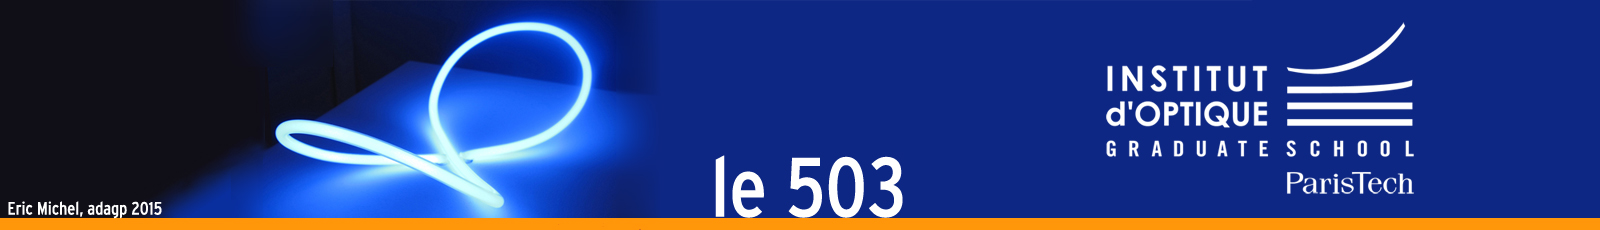 Le 503